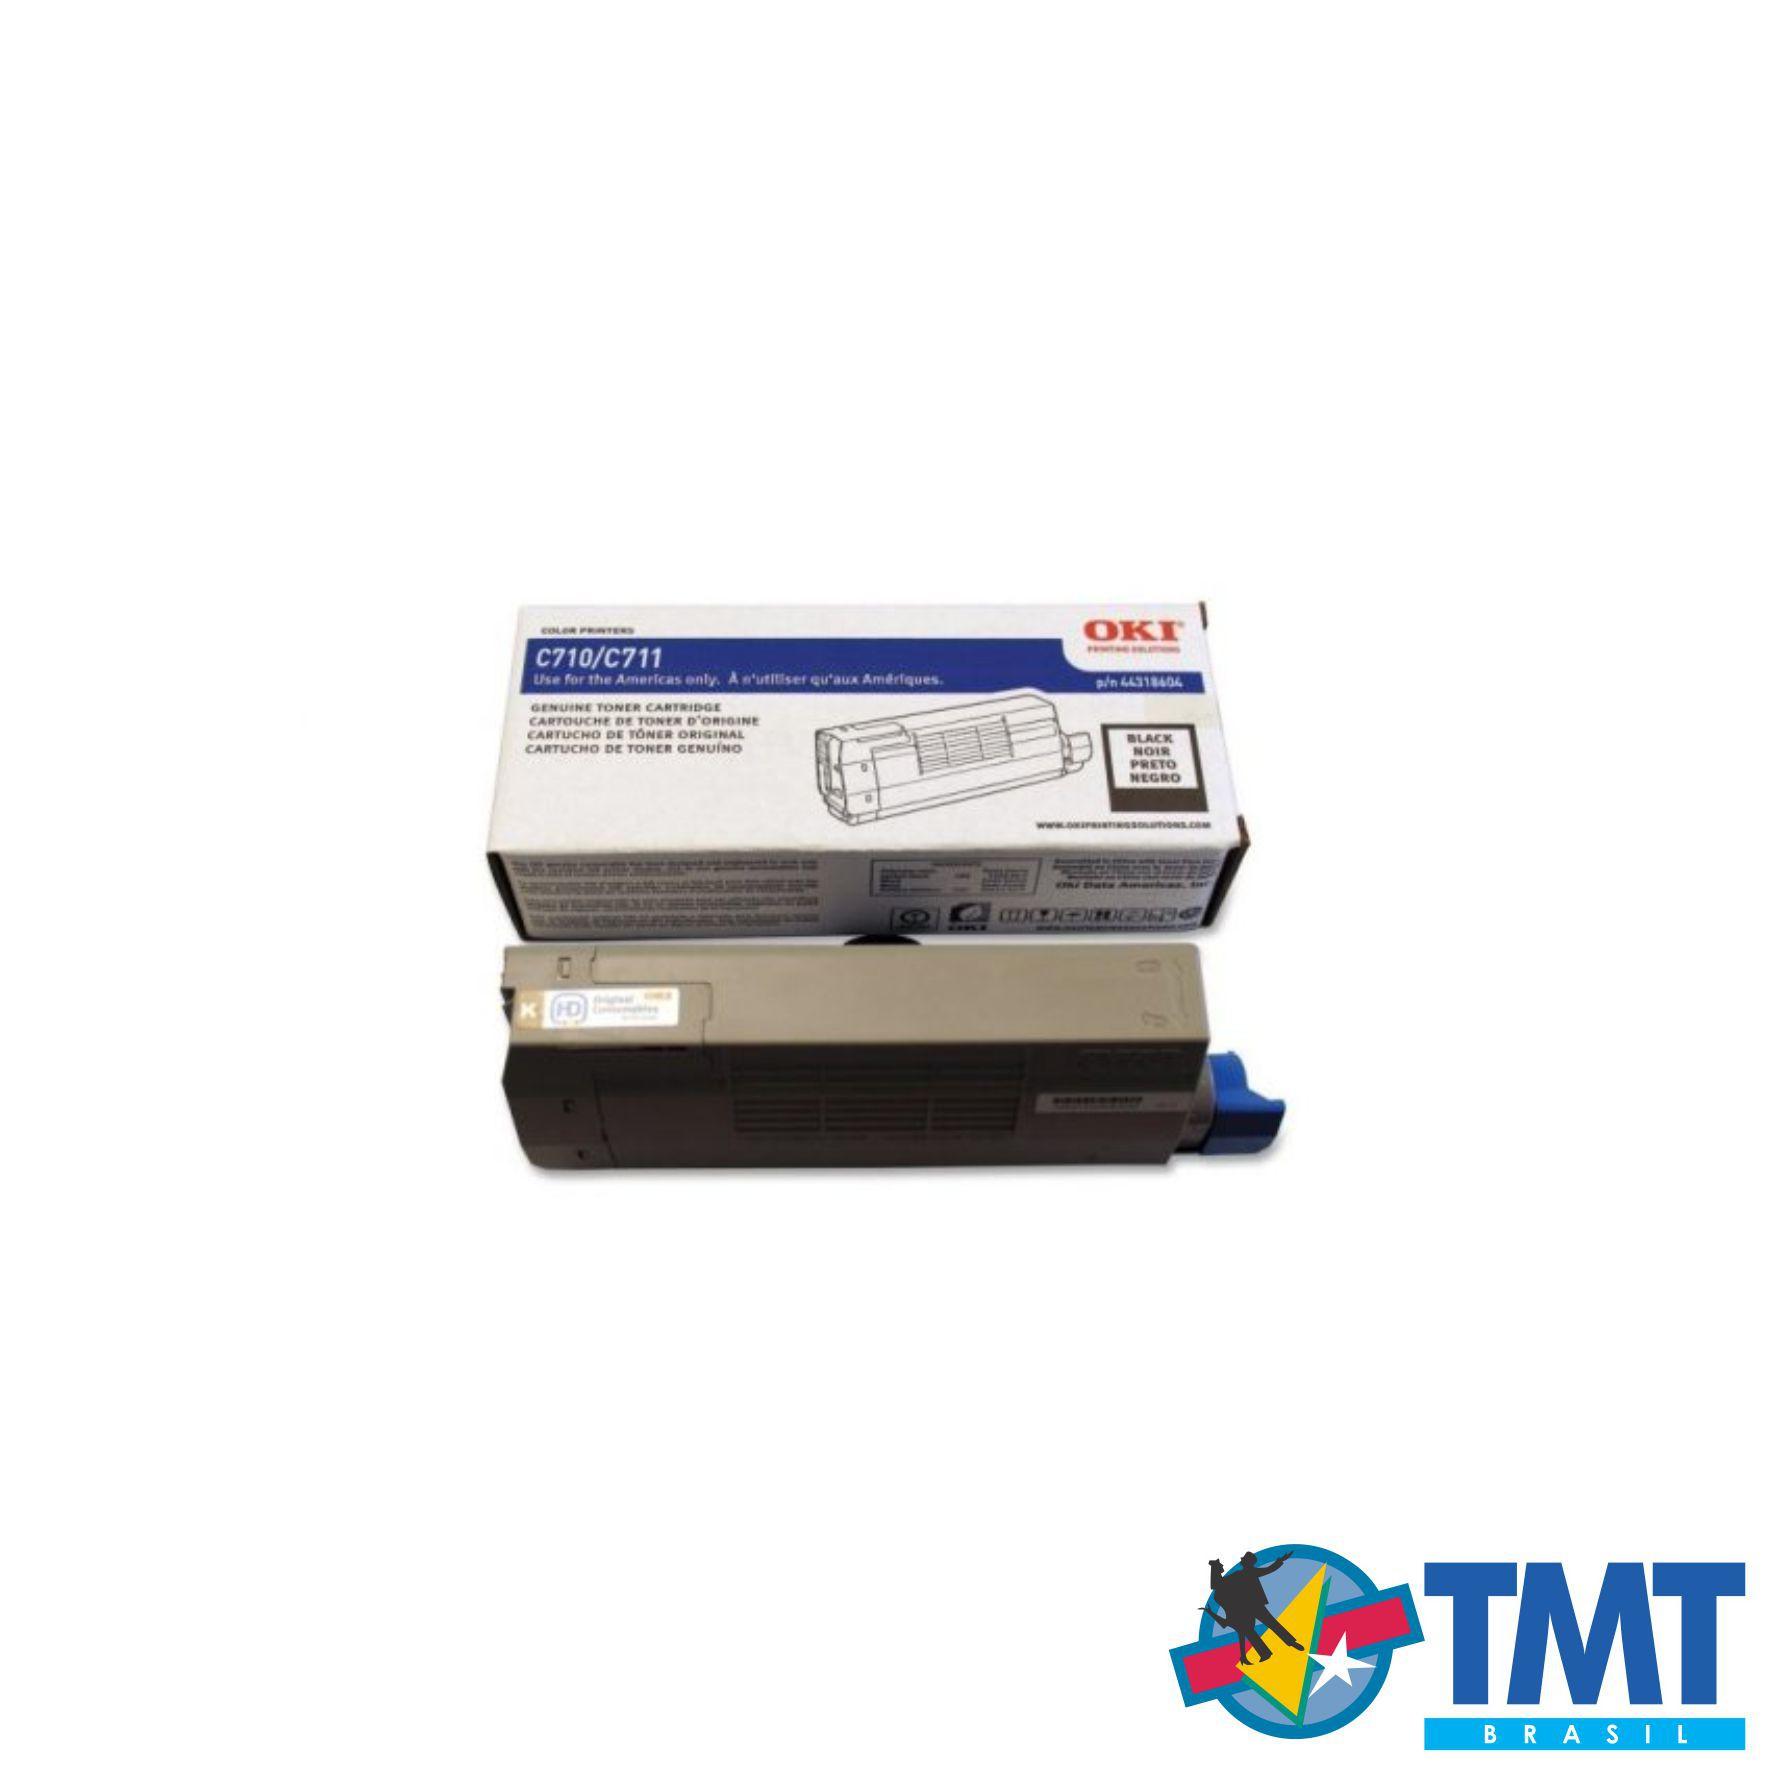 Cartucho de Toner Preto OKI C711 - Alta Capacidade